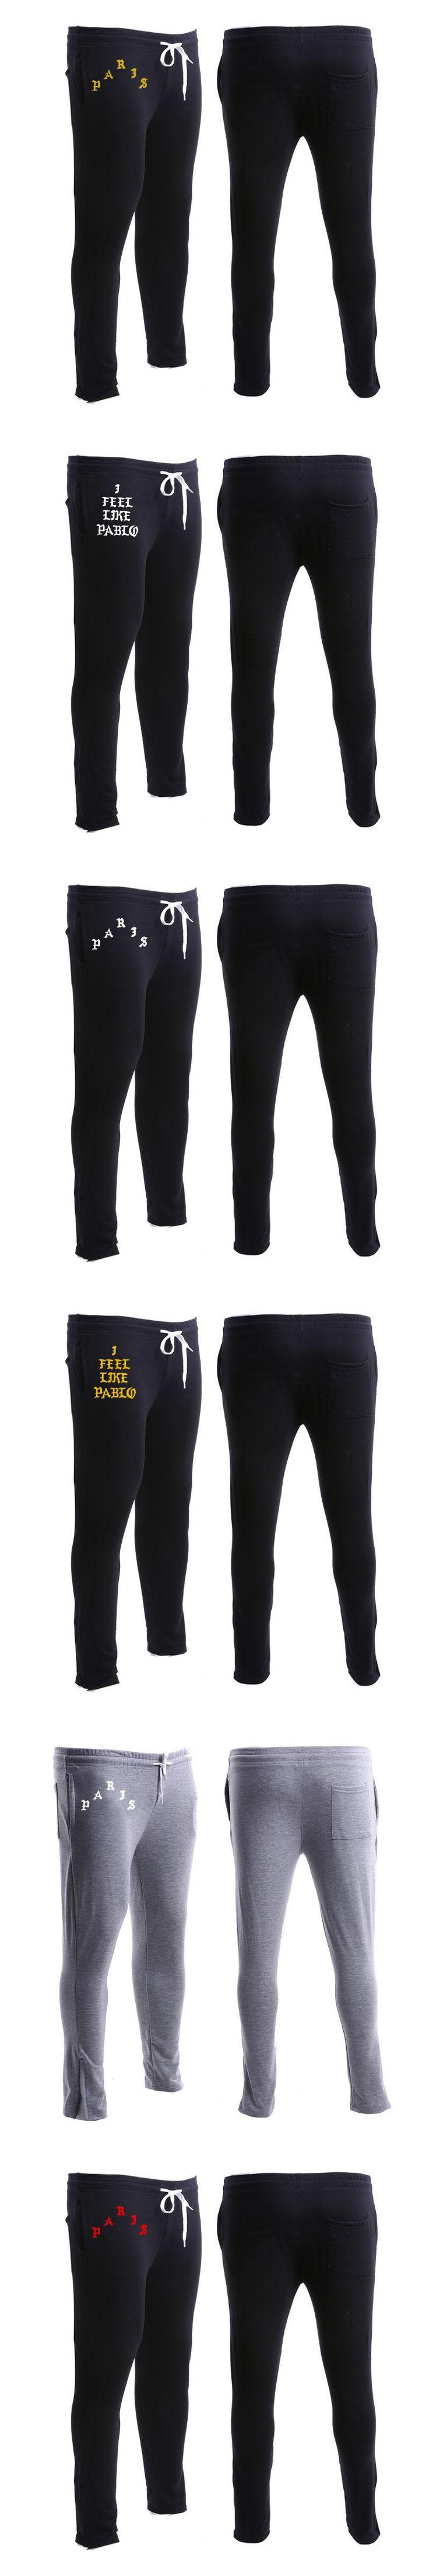 Fashion Kanye West Pants Men Golds Gyms Clothing Men Joggers Pants Women Bodybuilding Sweatpants Women I Feel Like Paul Pablo